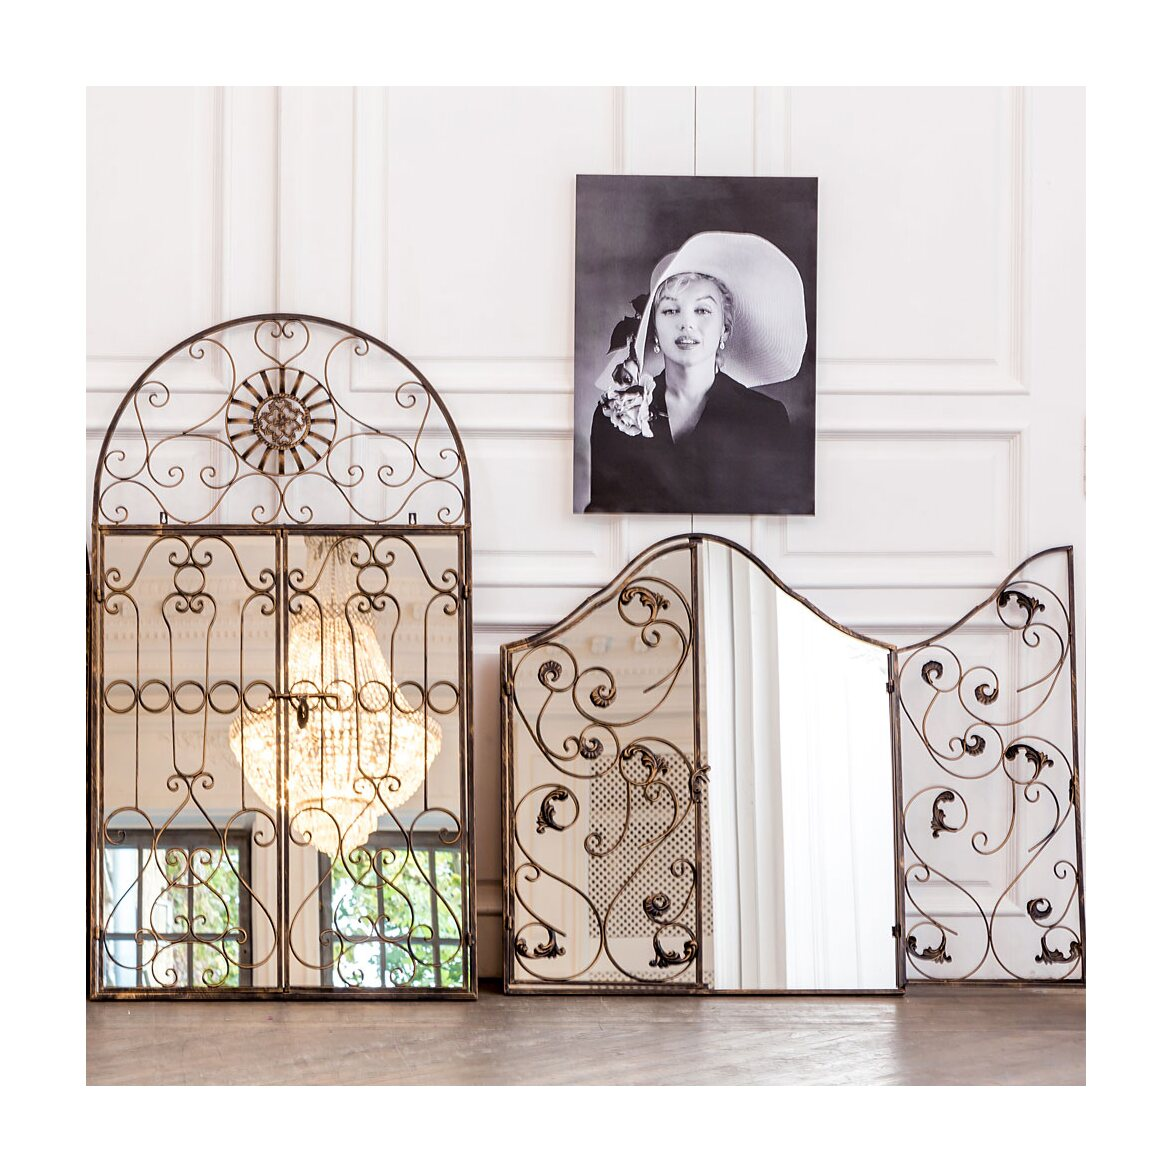 Настенное зеркало «Дивон» (королевская бронза) 7 | Настенные зеркала Kingsby